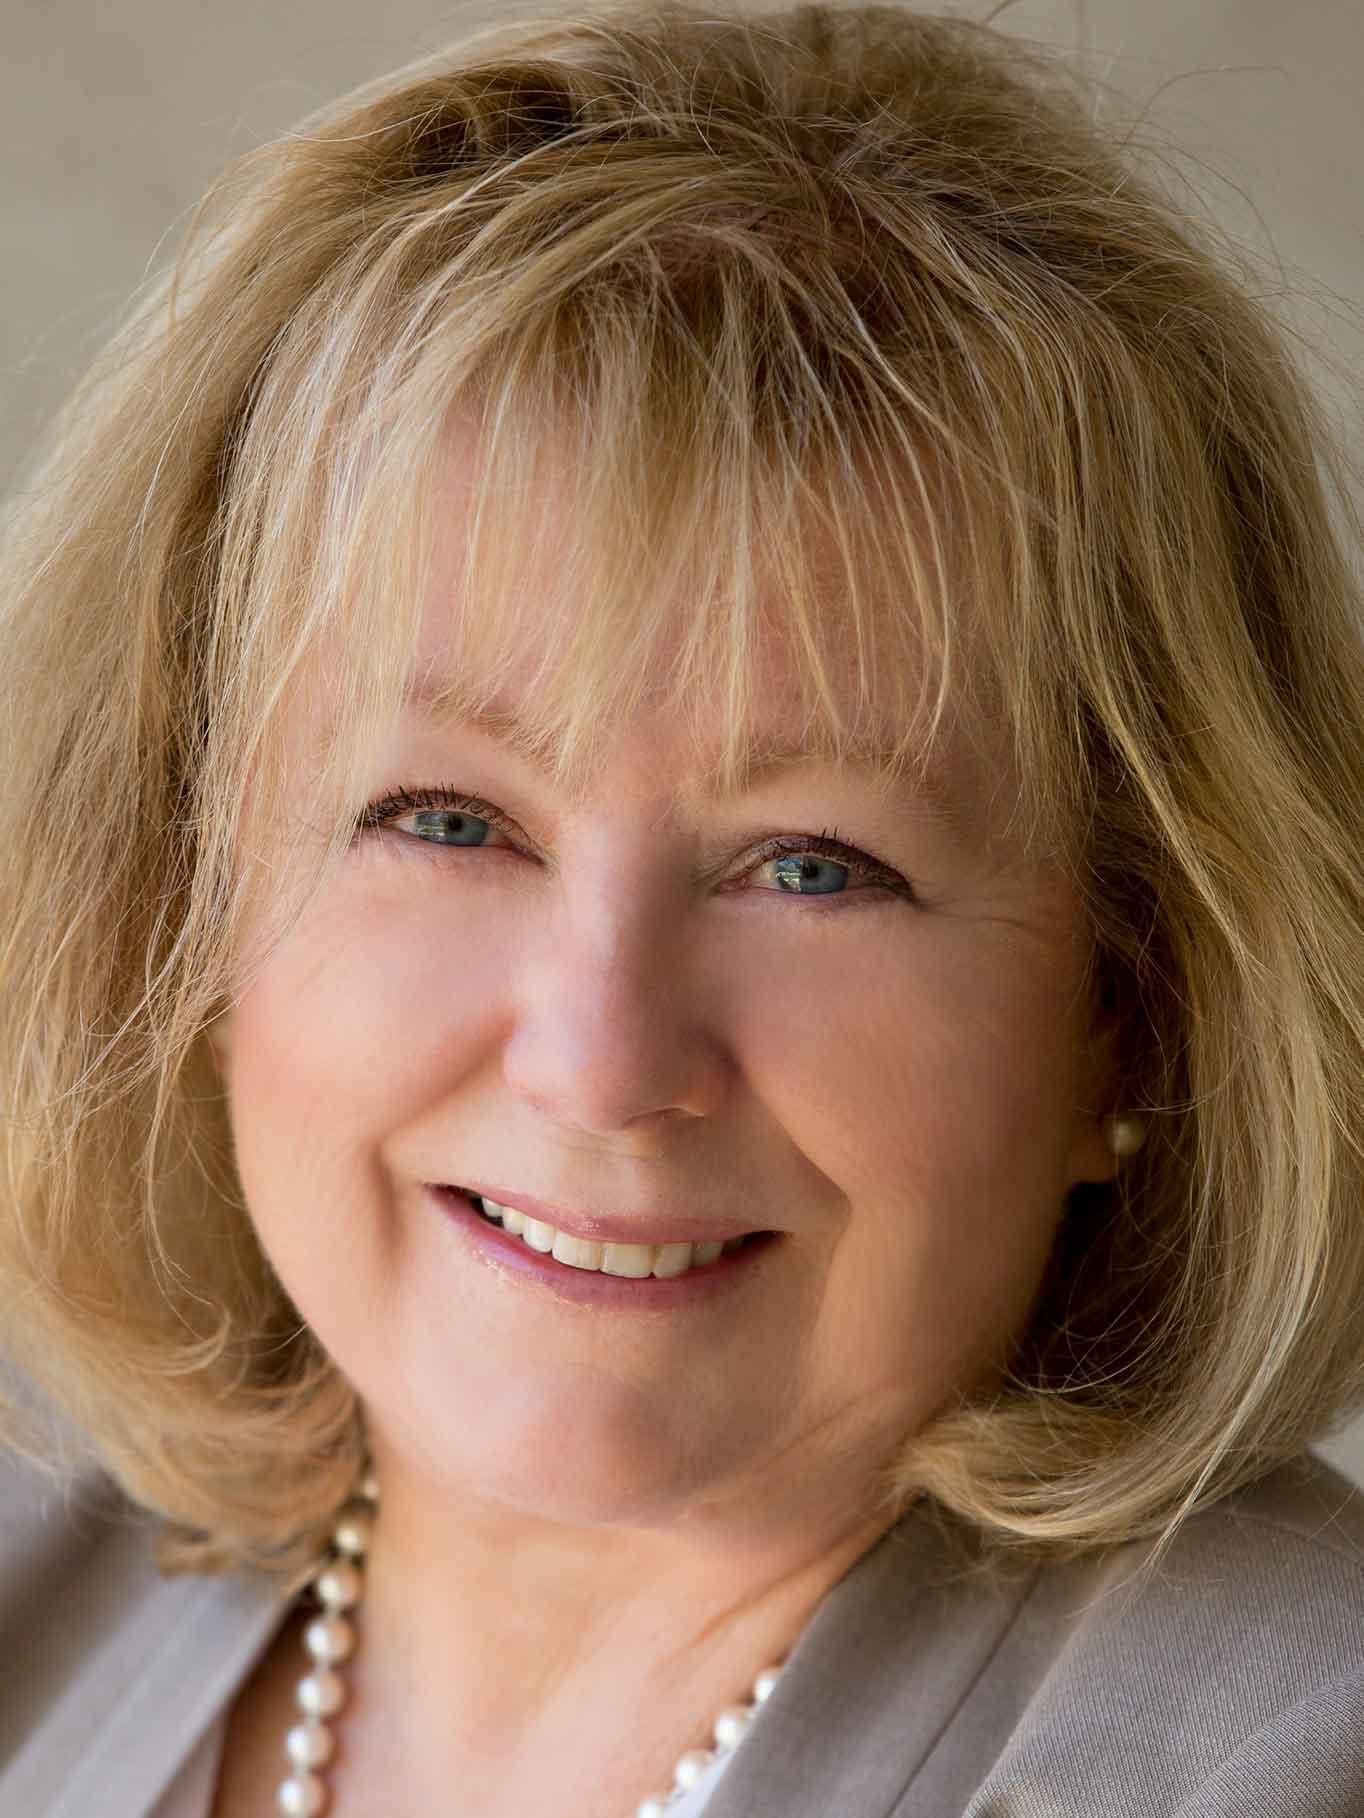 Janeal LeBaron